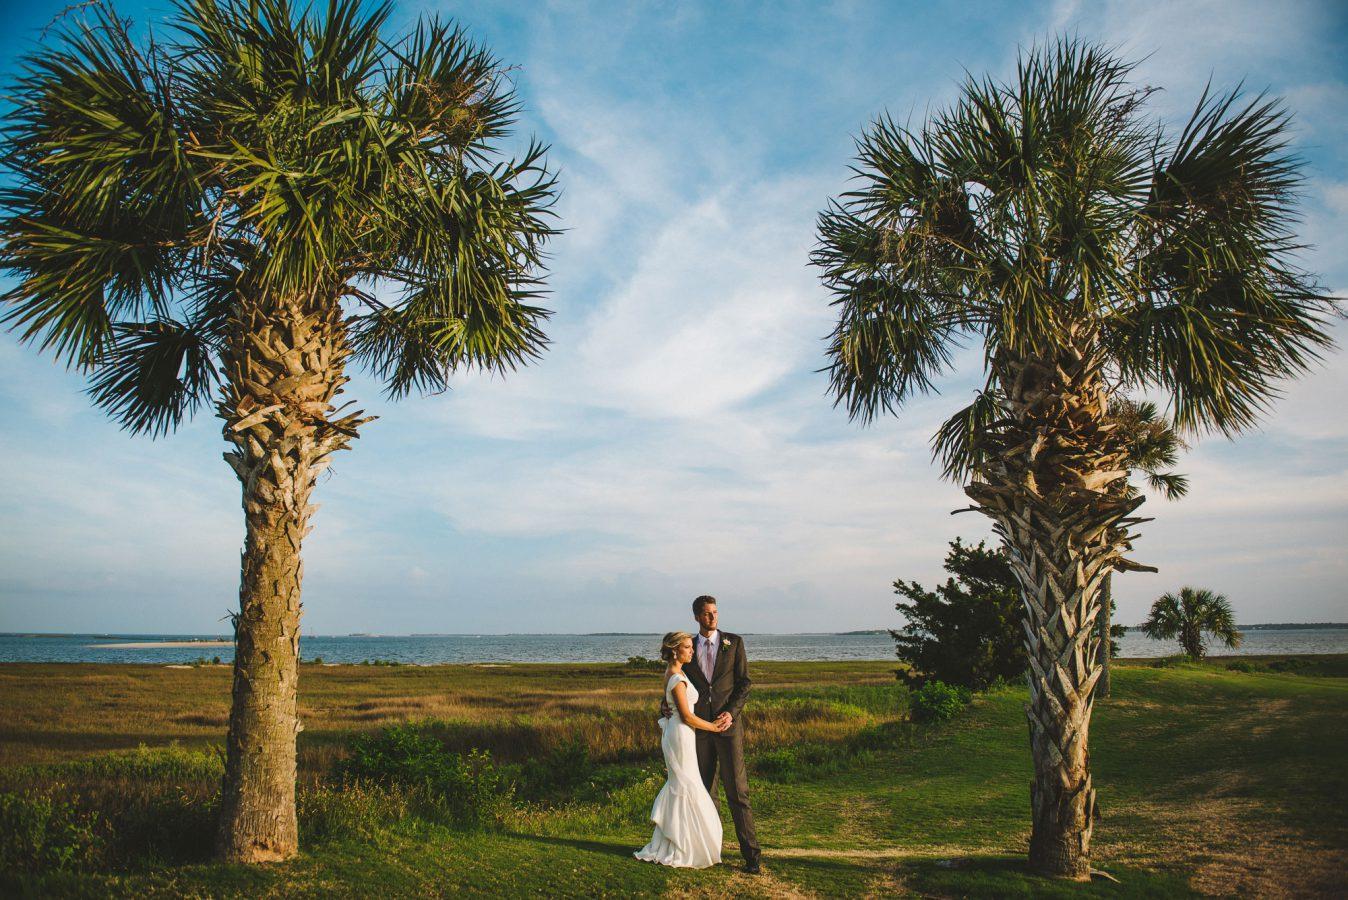 fete-photography-weddings-2017-004